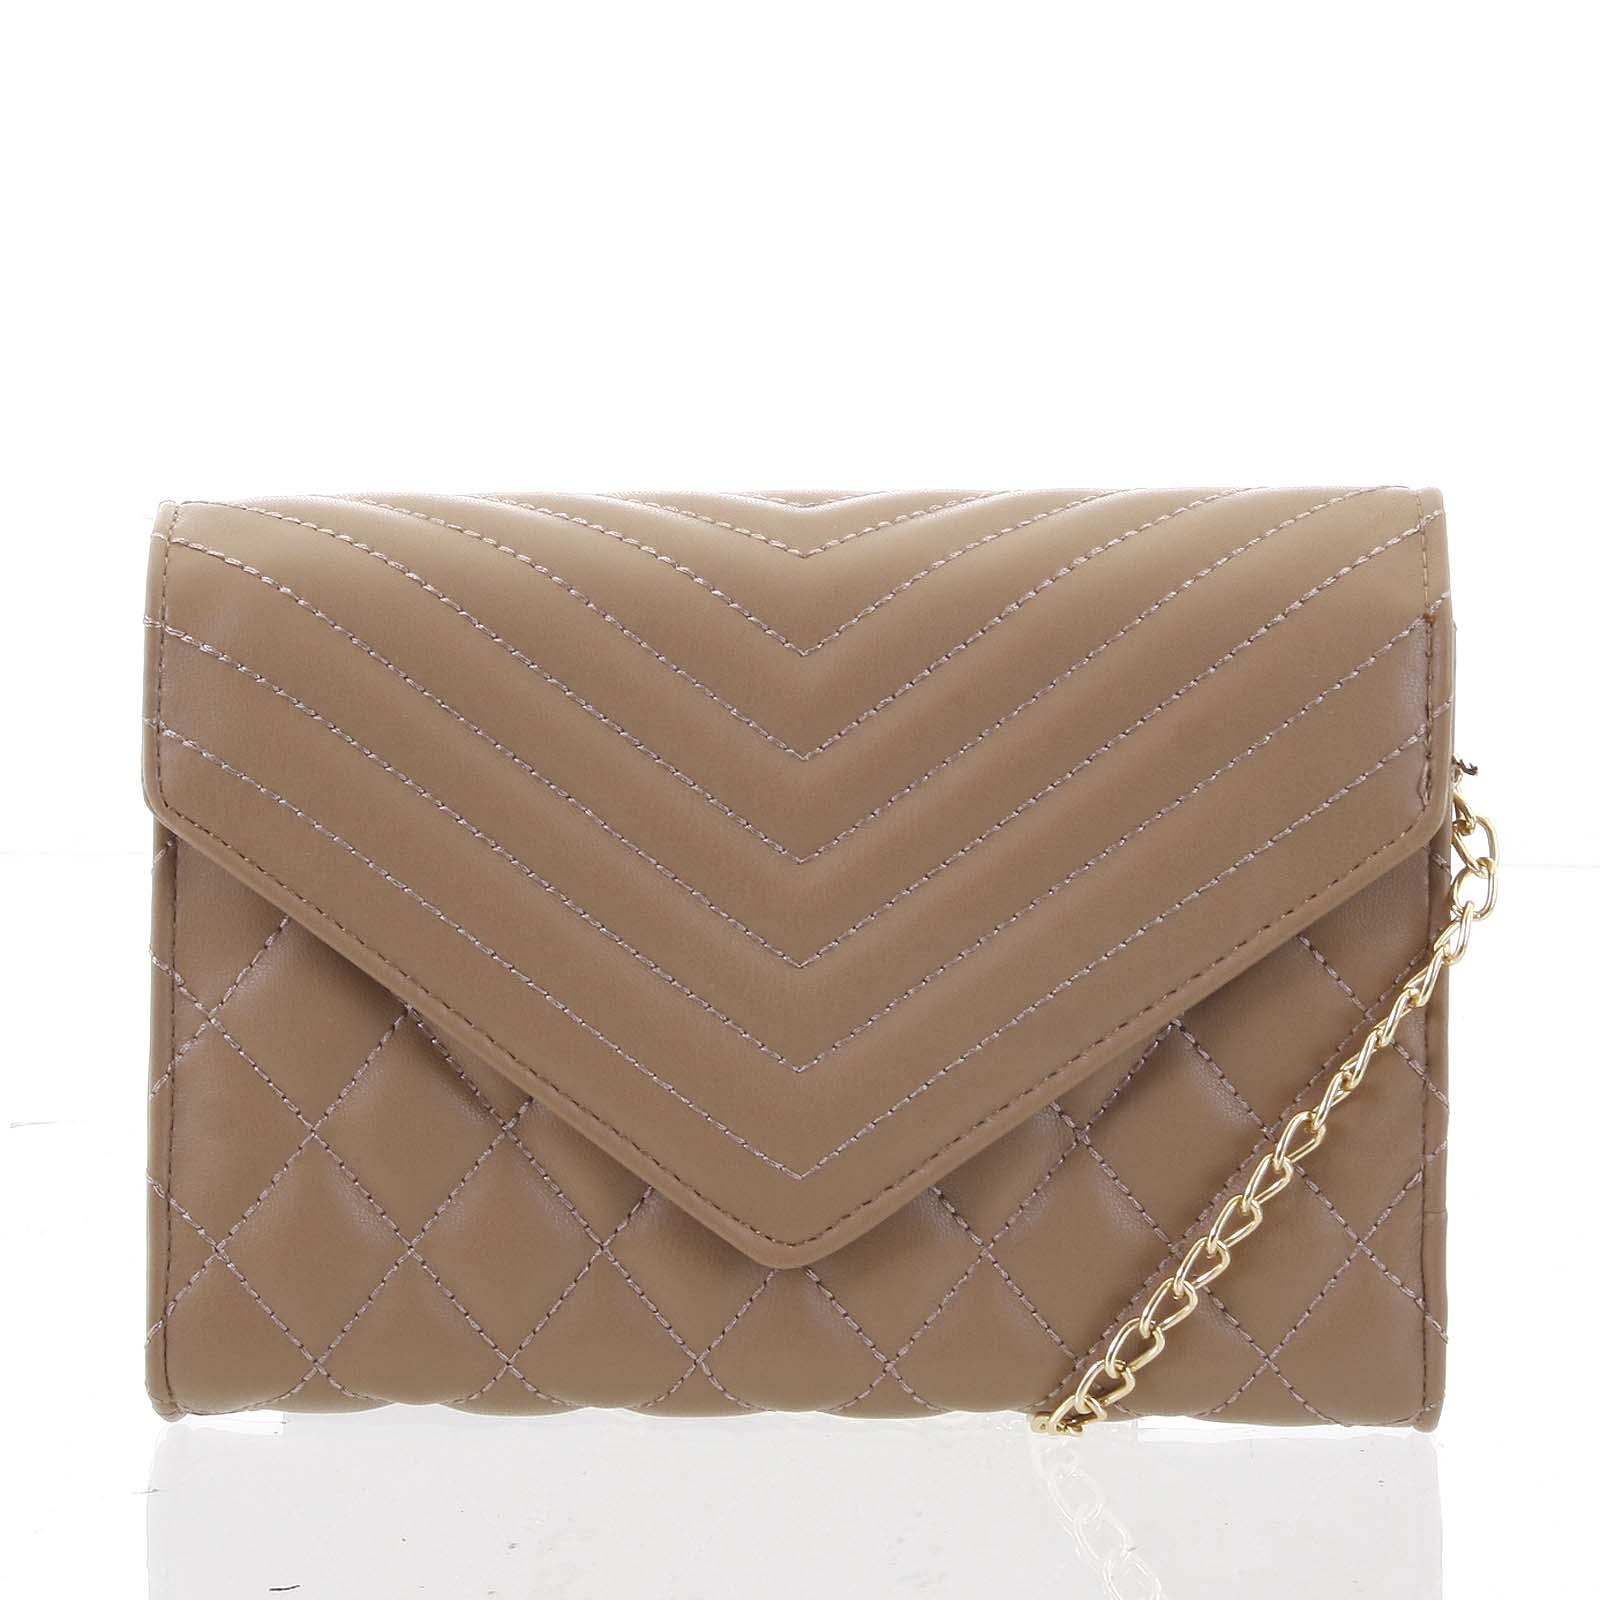 Originálna dámska prešívaná khaki listová kabelka - Delami Agnella ... bbc3d82bfe2